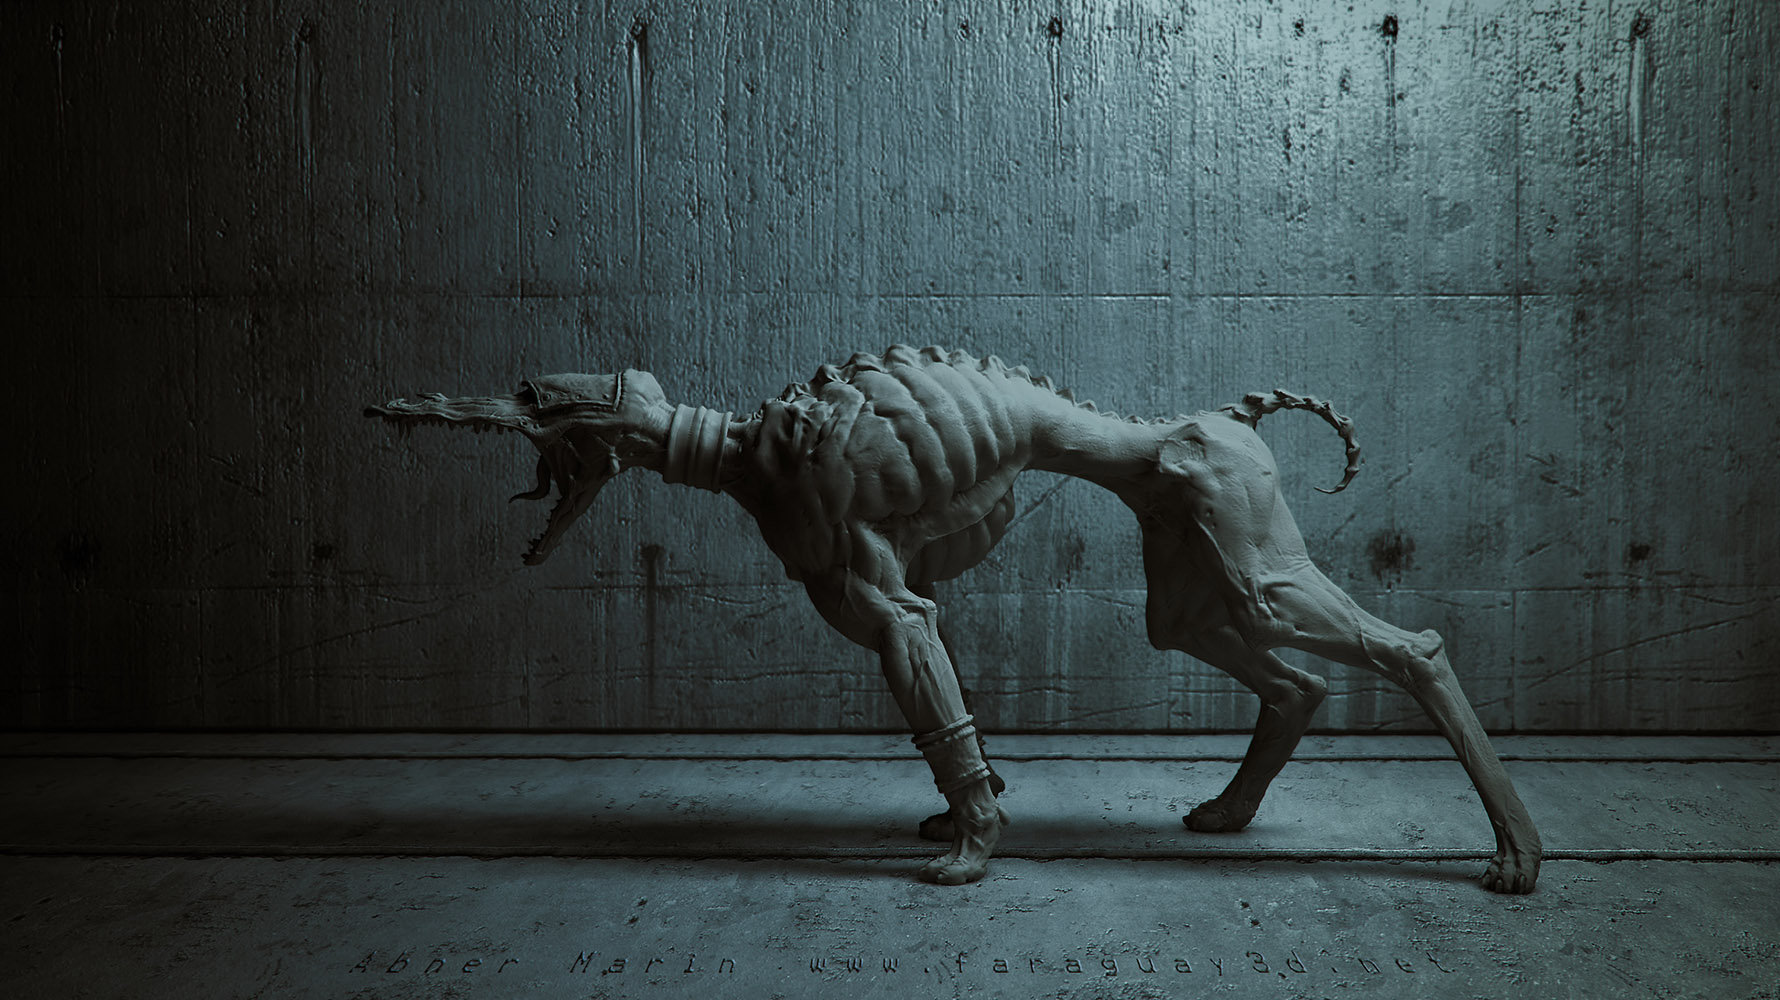 Abner marin faraguay brom dog